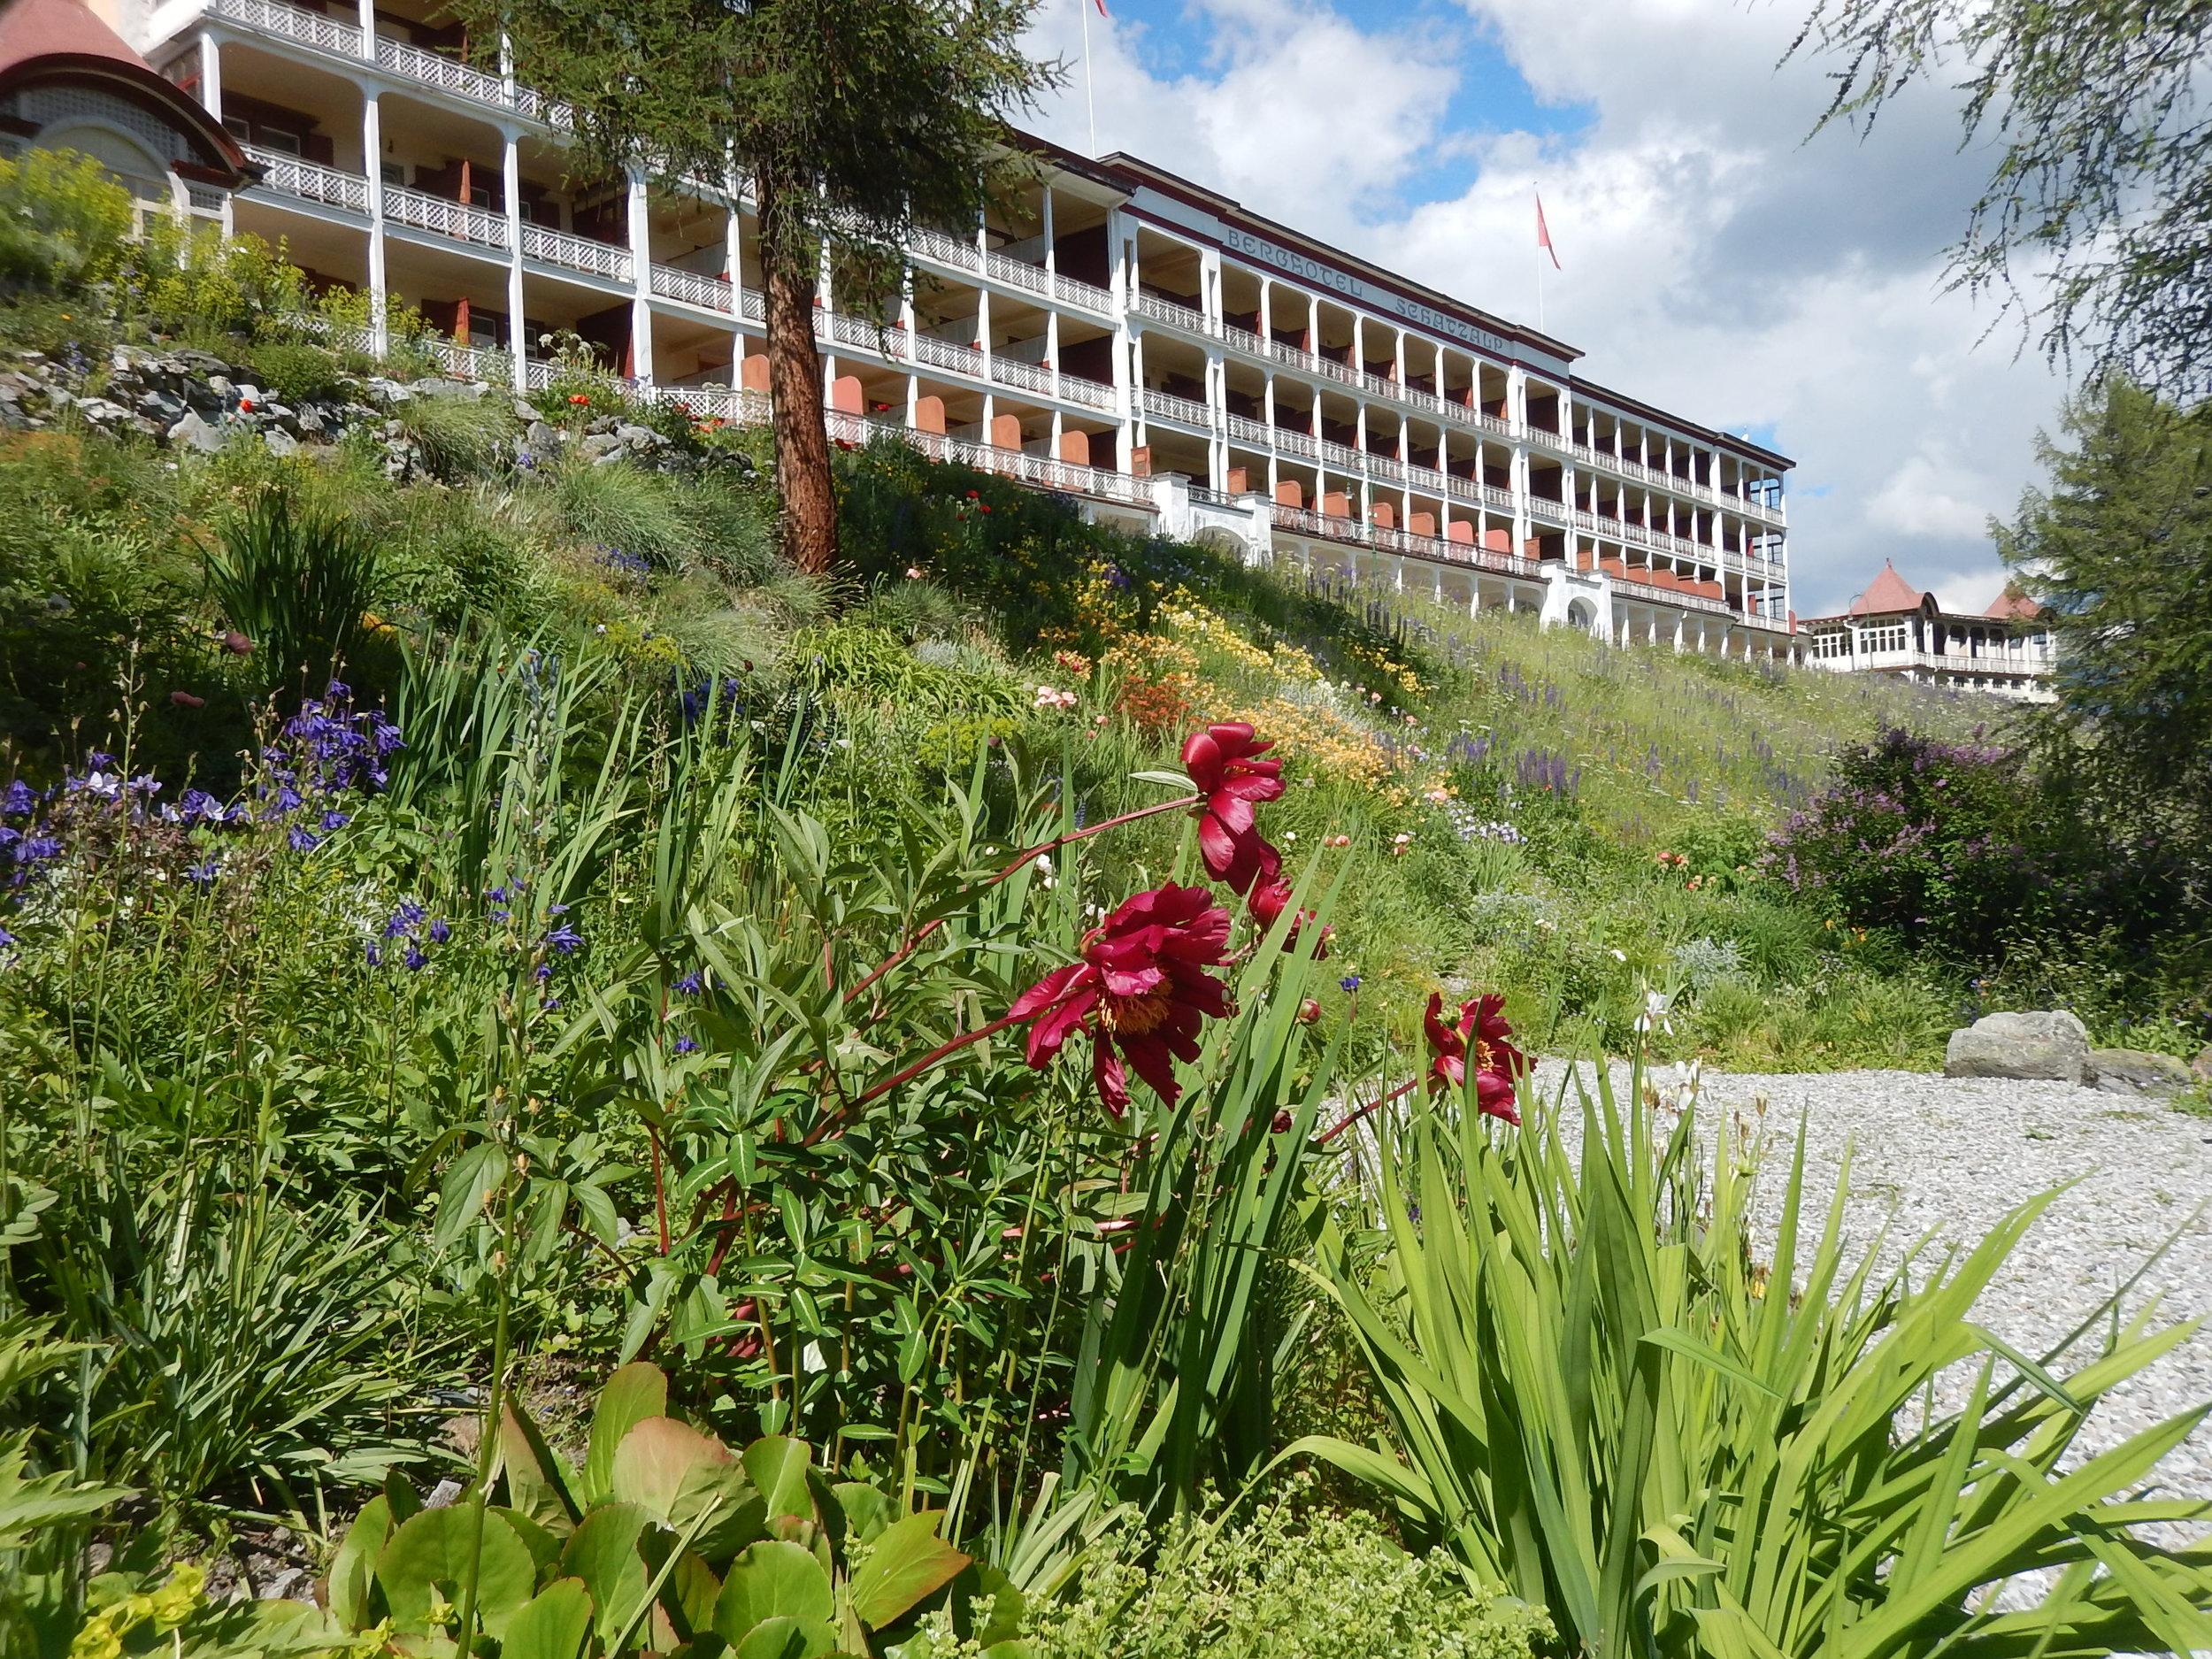 Schatzalp hotel. My room is at the back facing the ski runs.